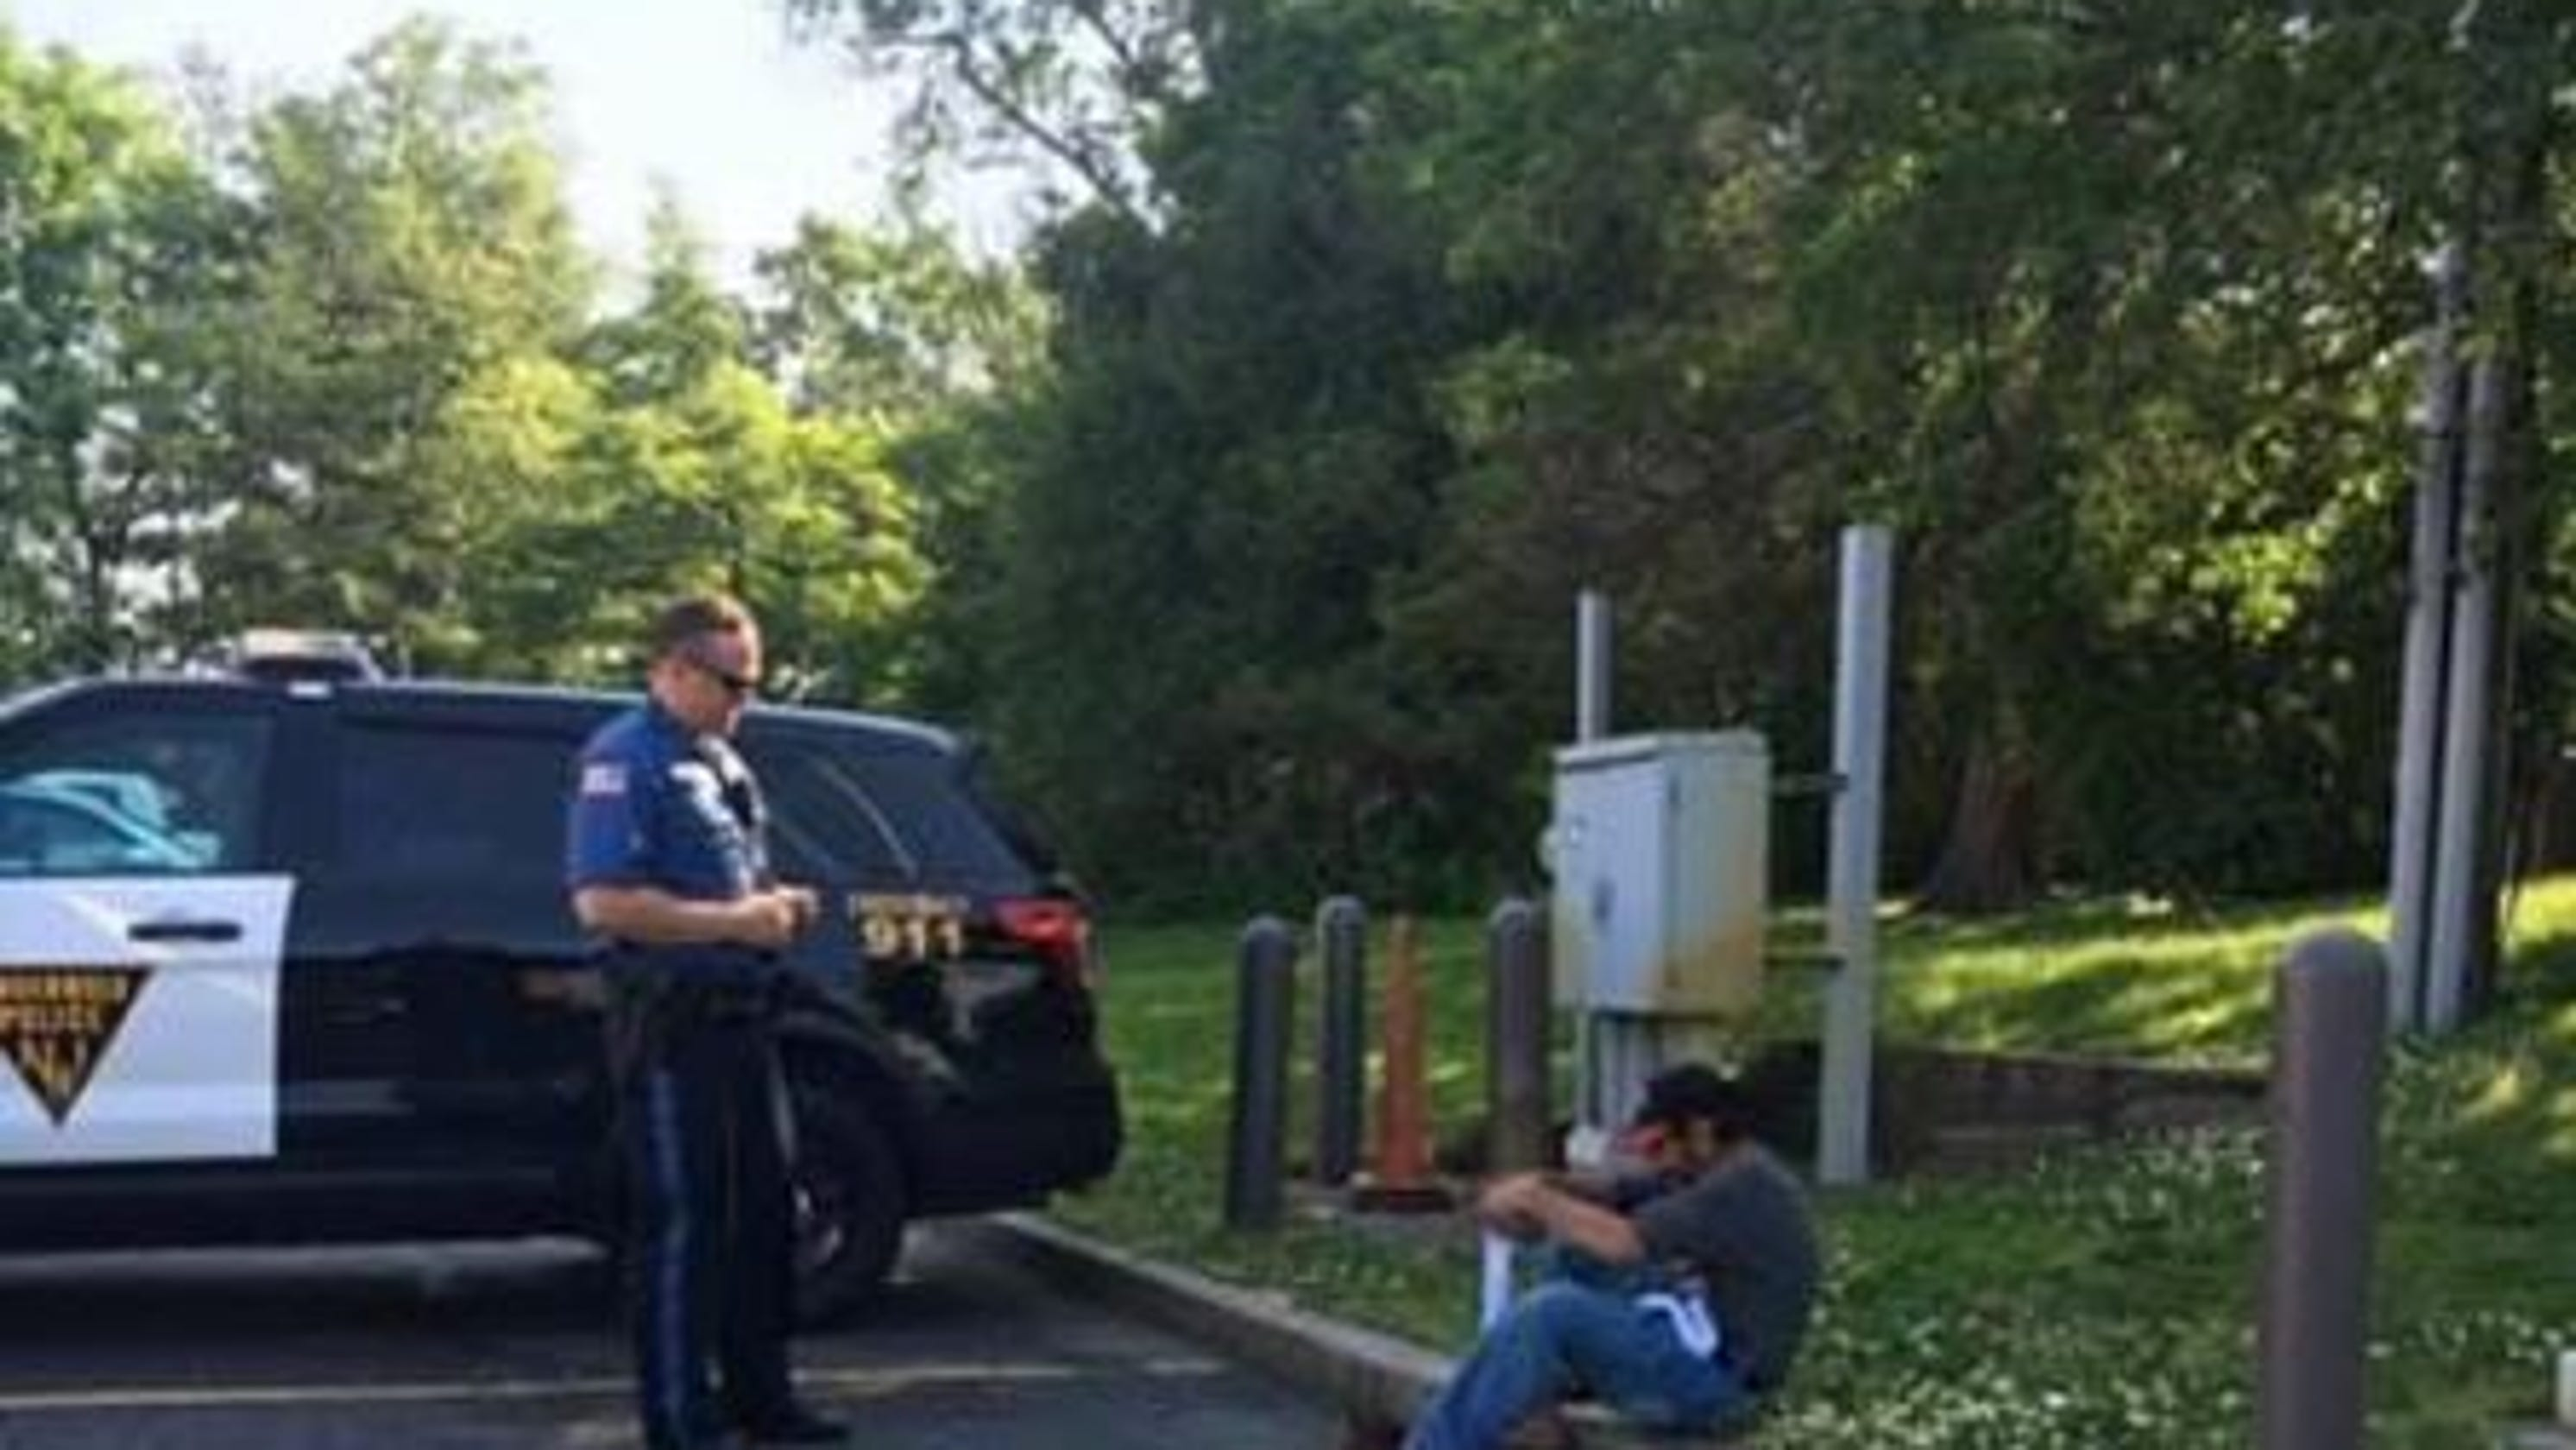 Random Act Of Kindness: NJ Officer Gives New Socks To